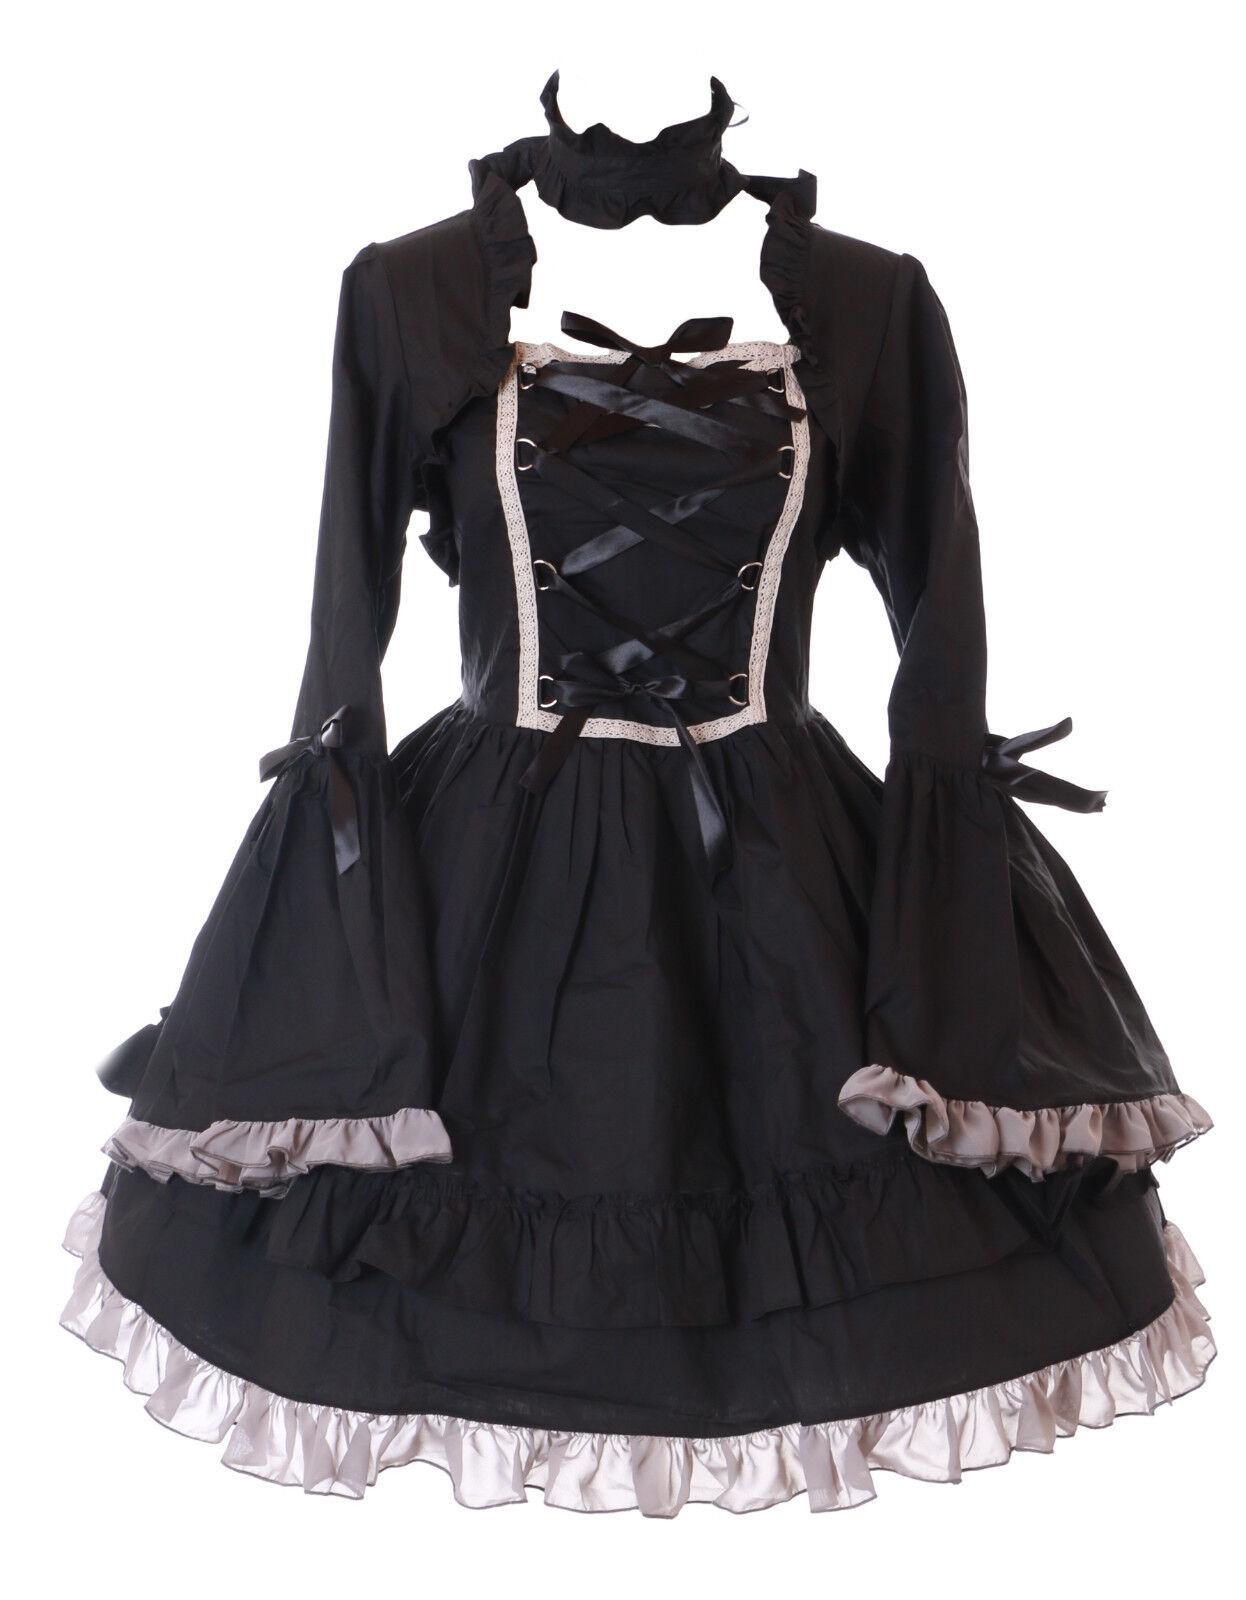 L-647-2 black Robe à Volants Victorien Classic Costume de Cosplay Gothique Lolita